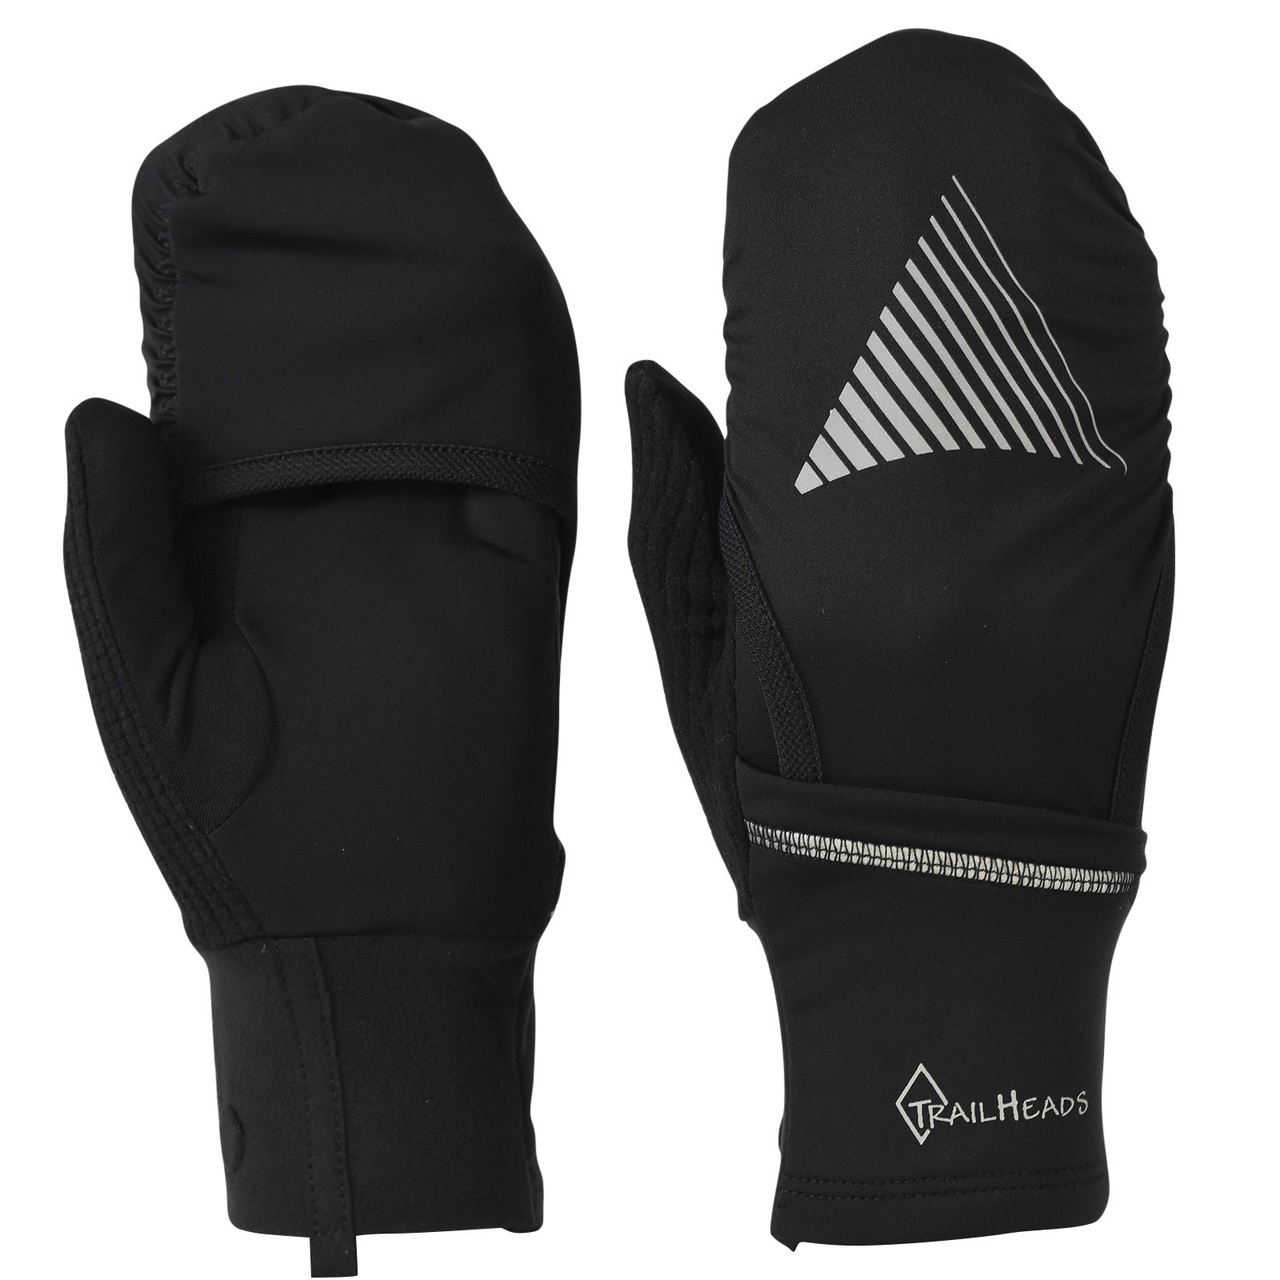 437a057a69c TrailHeads Convertible Running Gloves - black   reflective